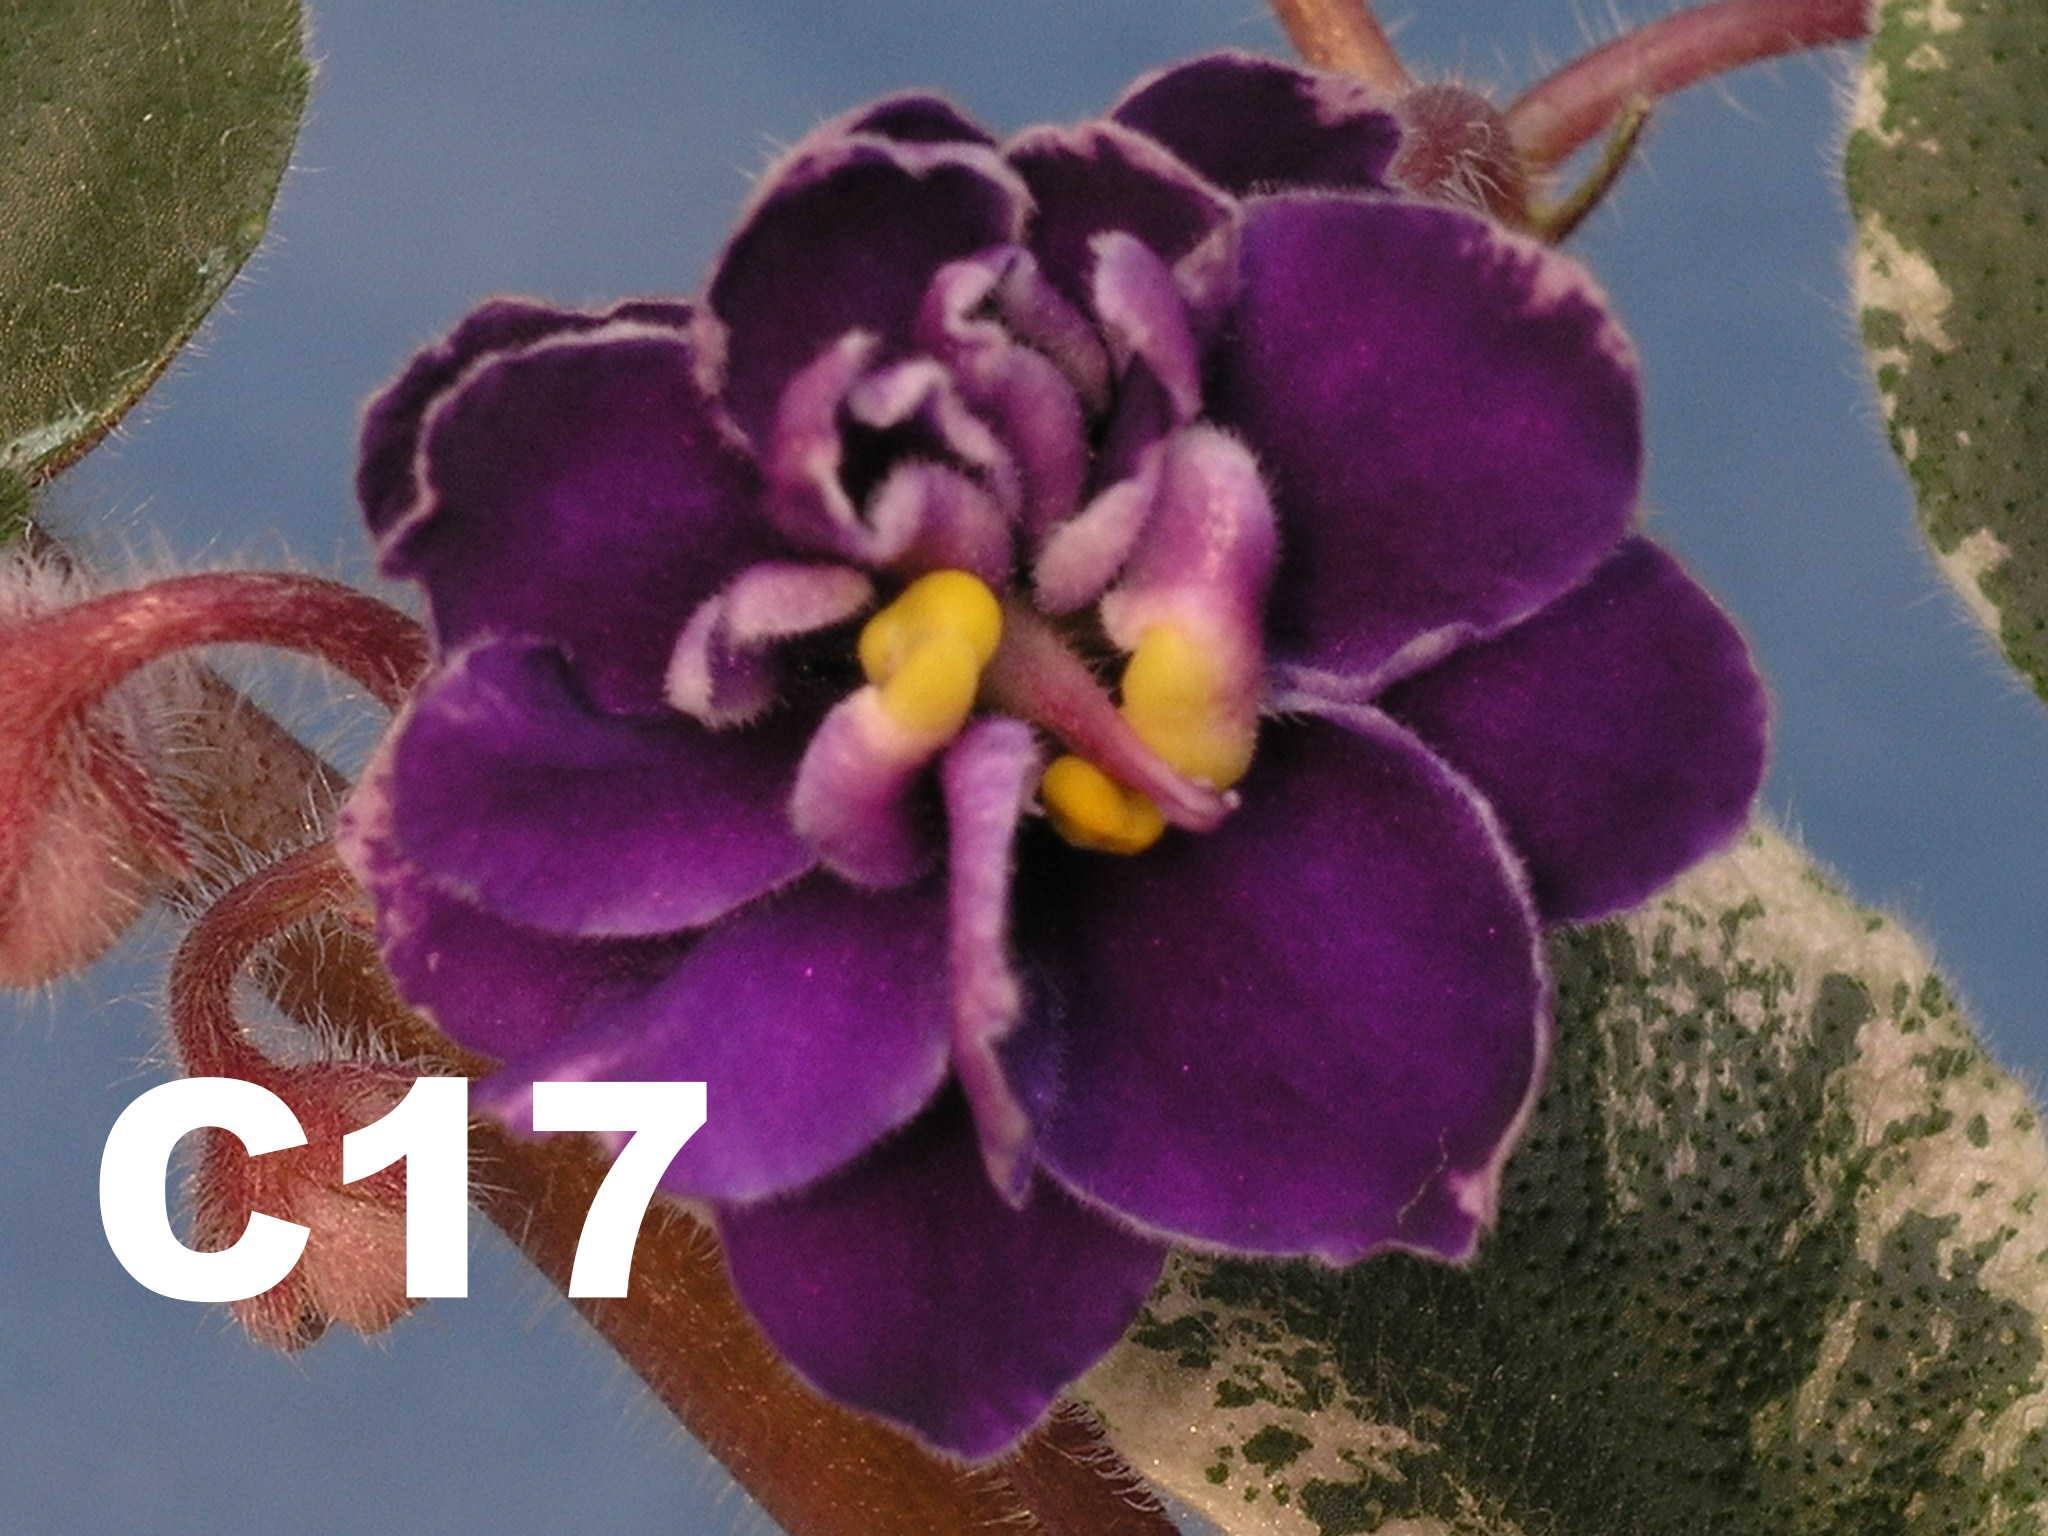 非洲紫羅蘭名錄 | African Violets Catalogue - C系列 C17